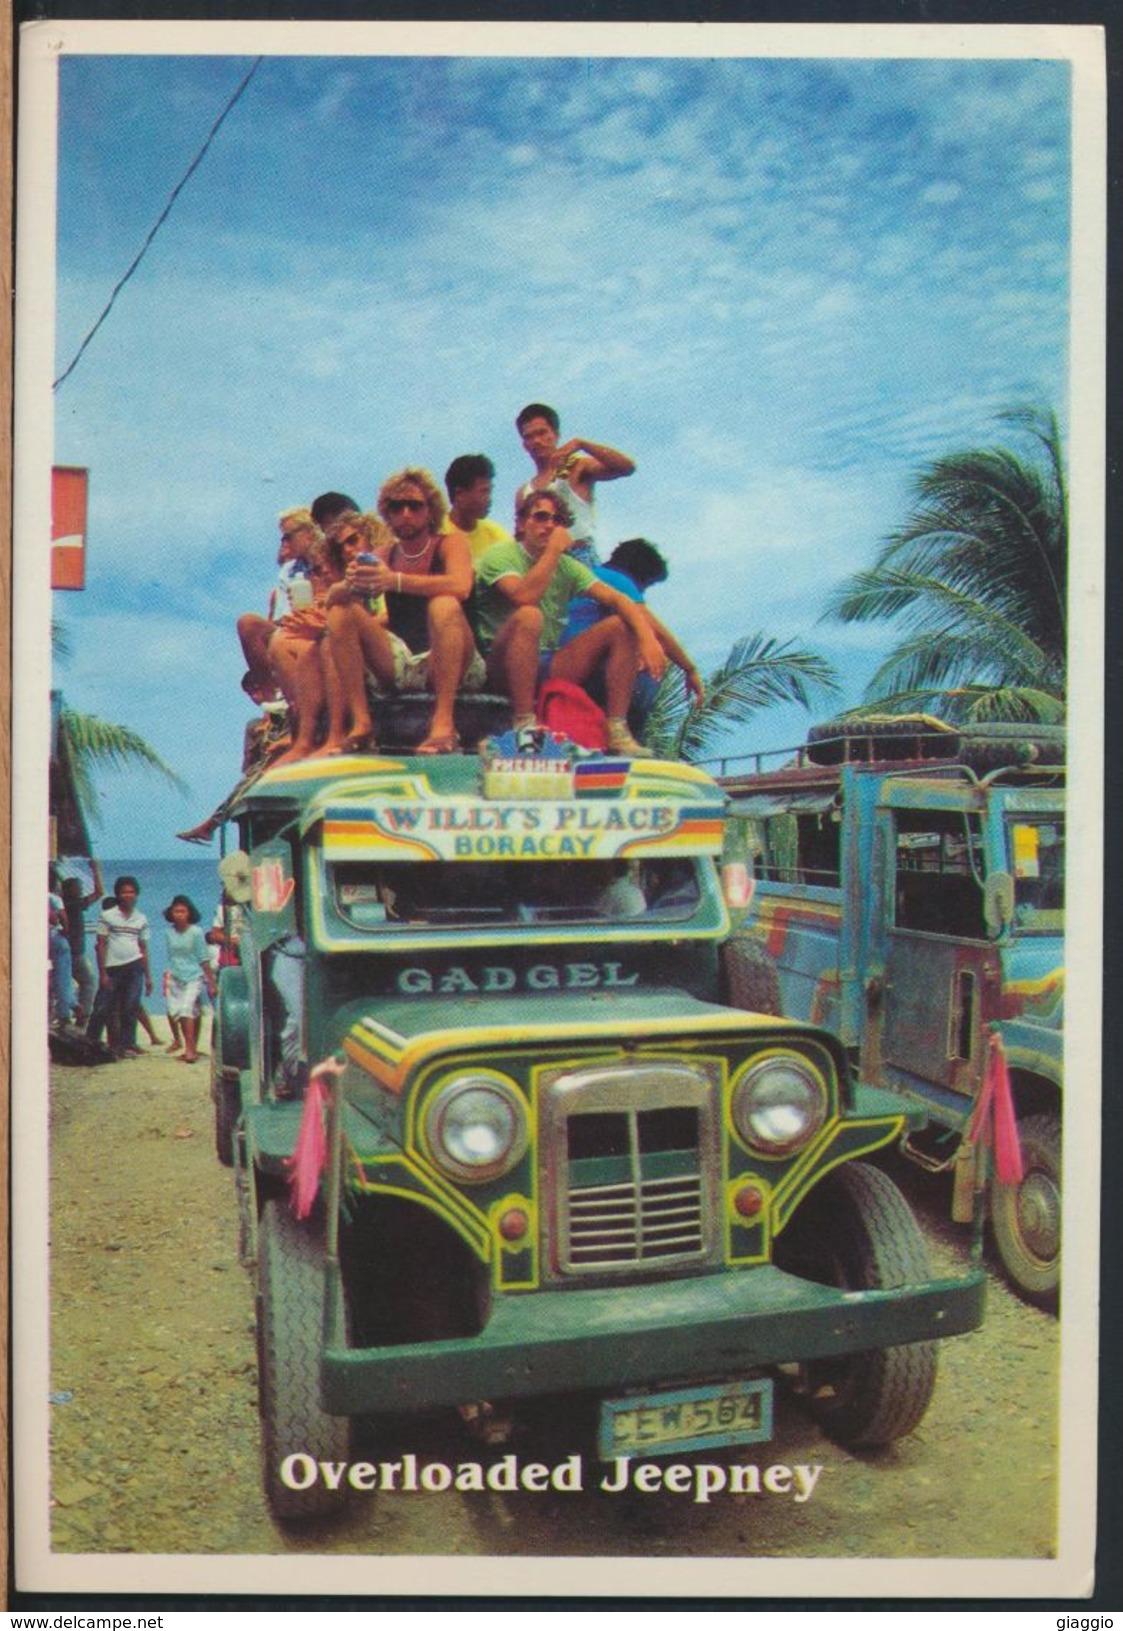 °°° 8703 - PHILIPPINES - OVERLOADED PASSENGER JEEPNEY FROM BORACAY KALIBO , AKLAN °°° - Filippine